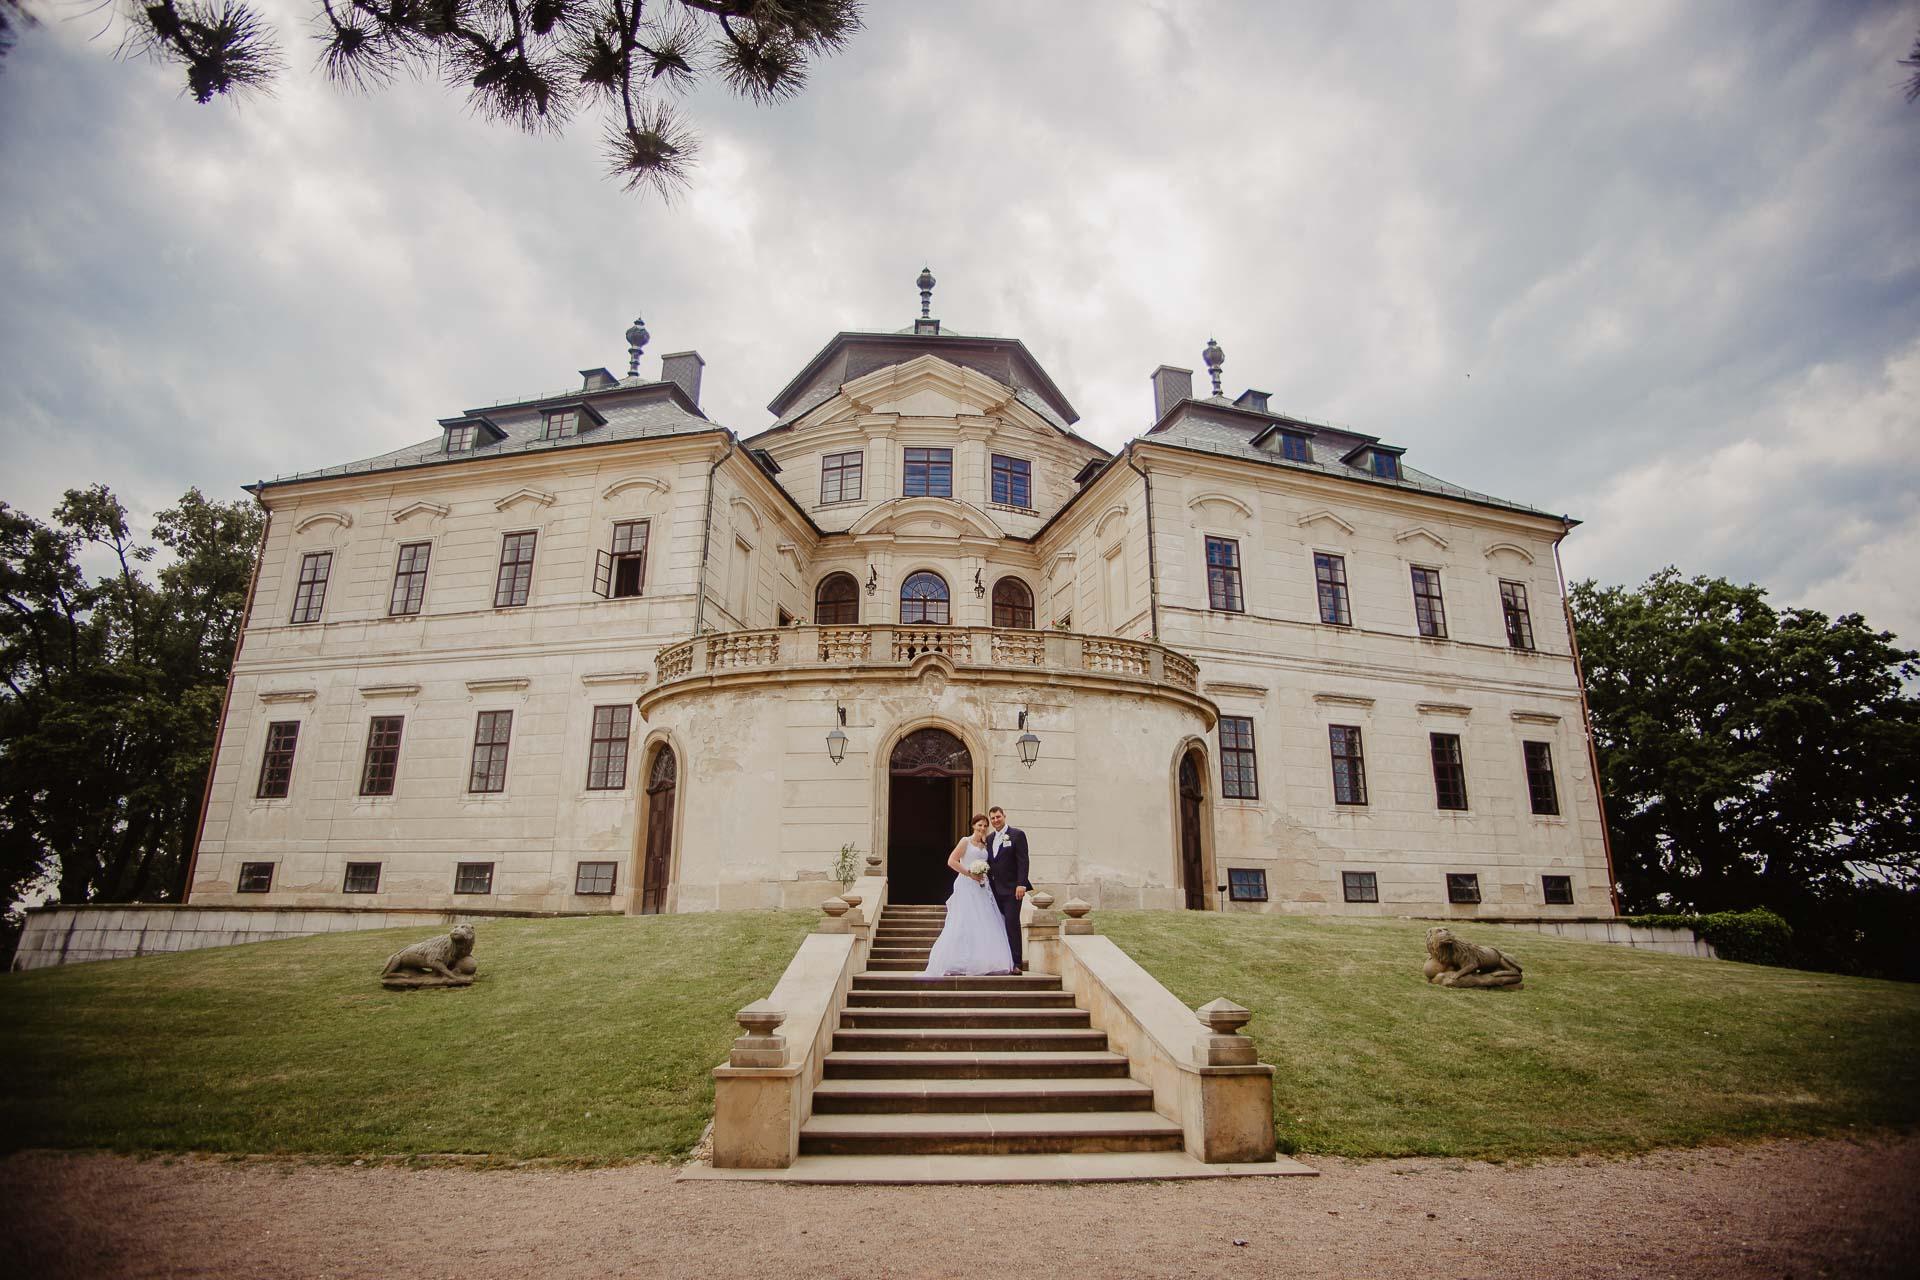 Svatební-fotograf-zámek-Karlova-Koruna-Chlumec-nad-Cidlinou-186